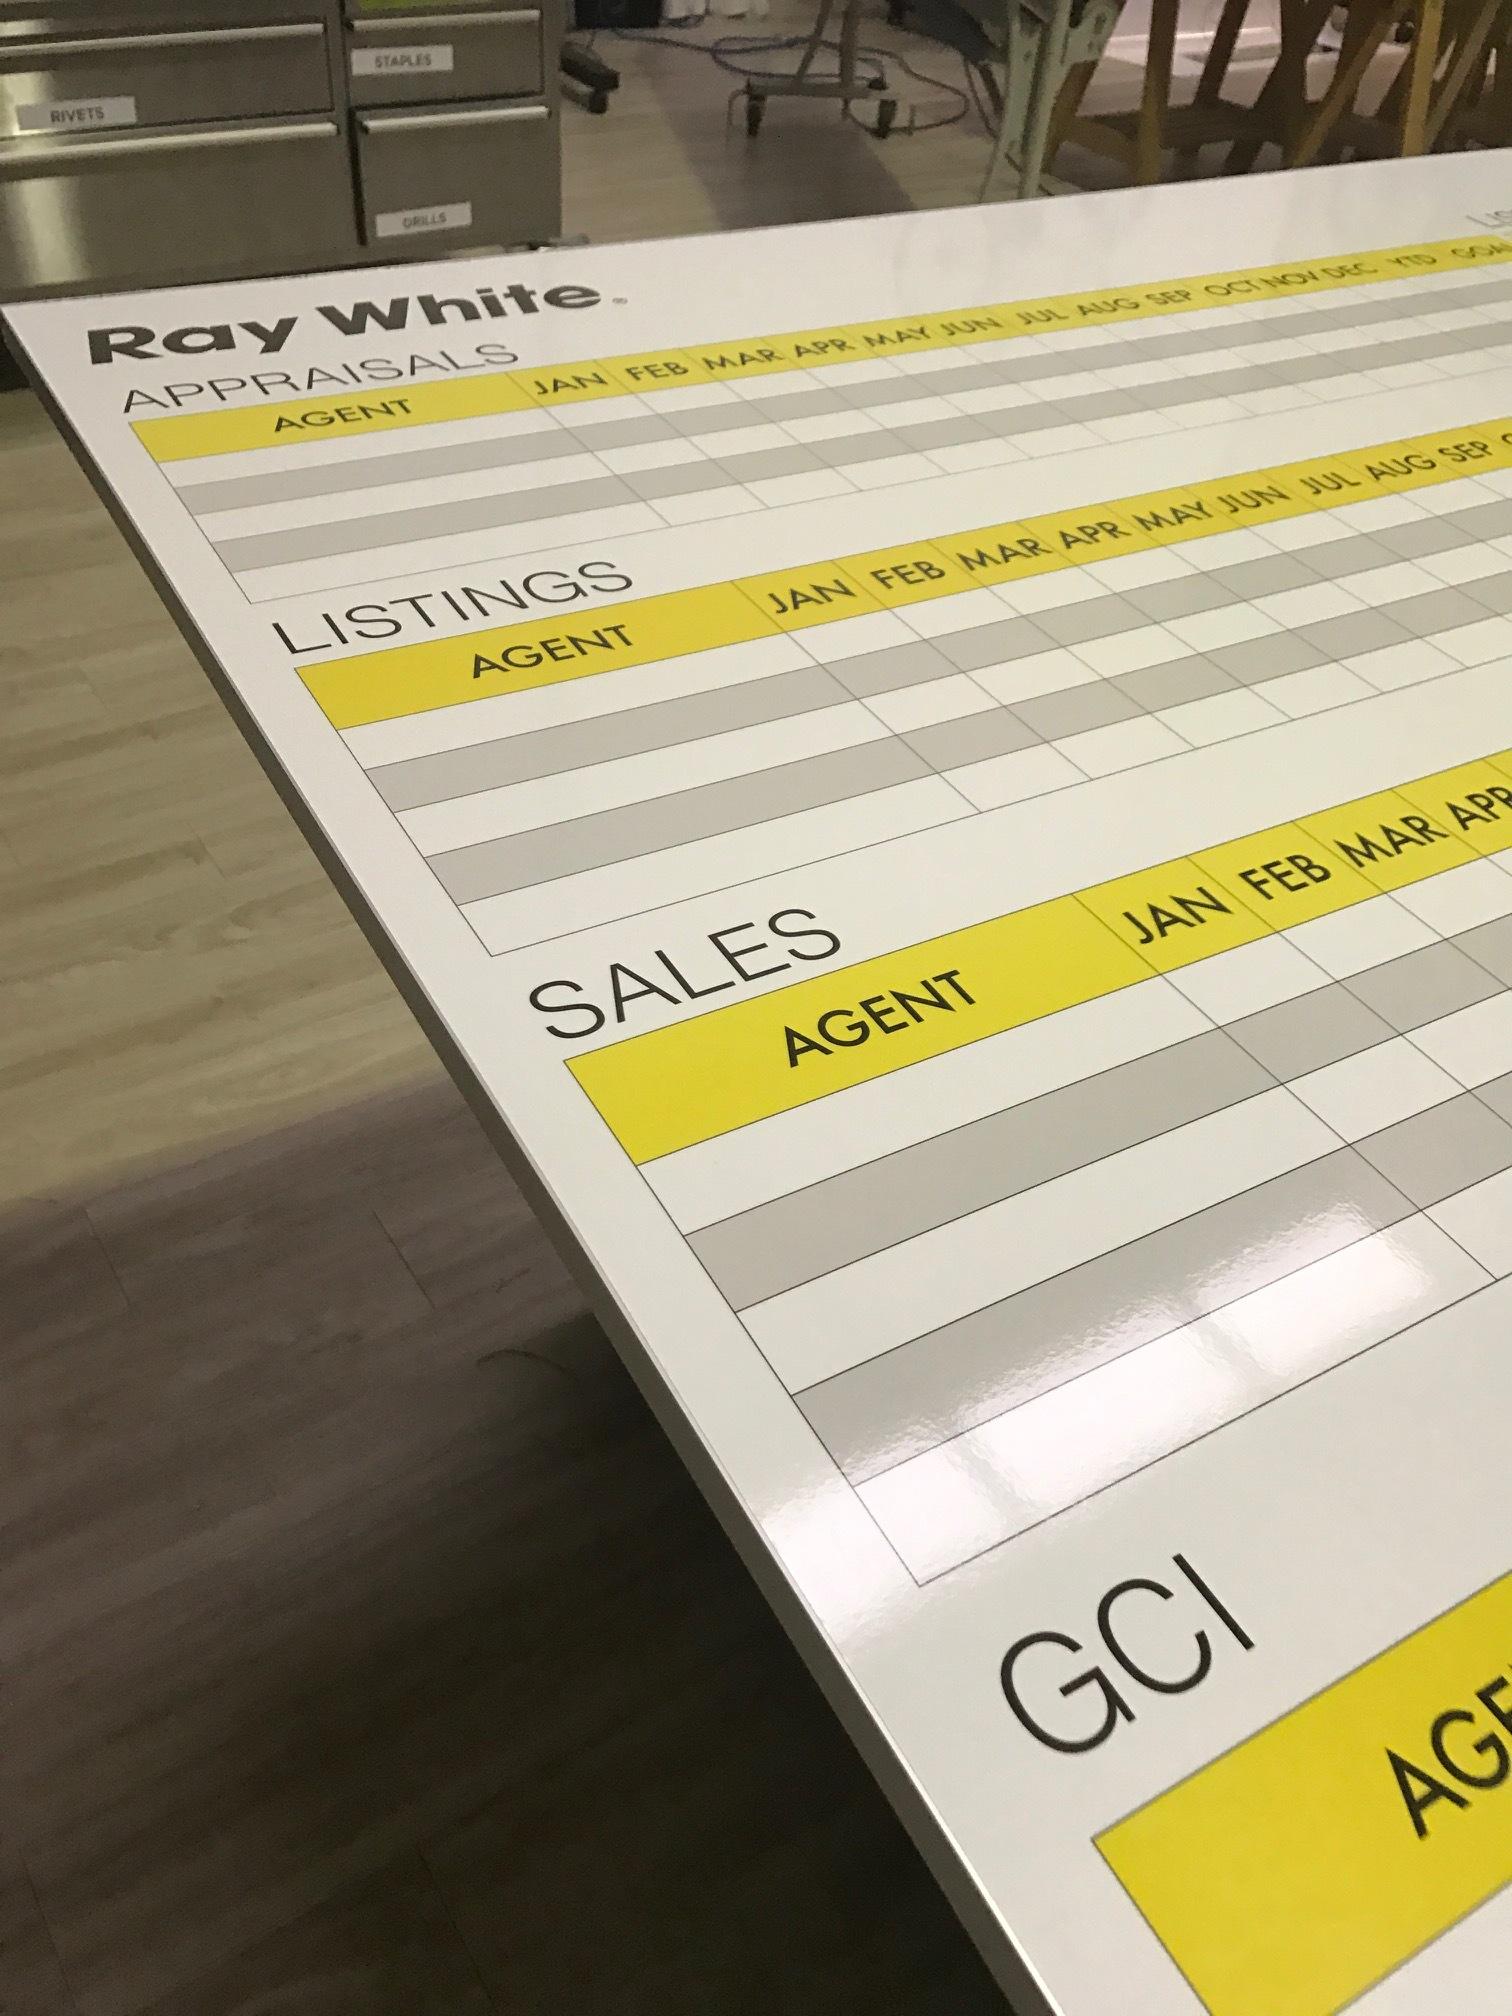 Ray White KPI whiteboard